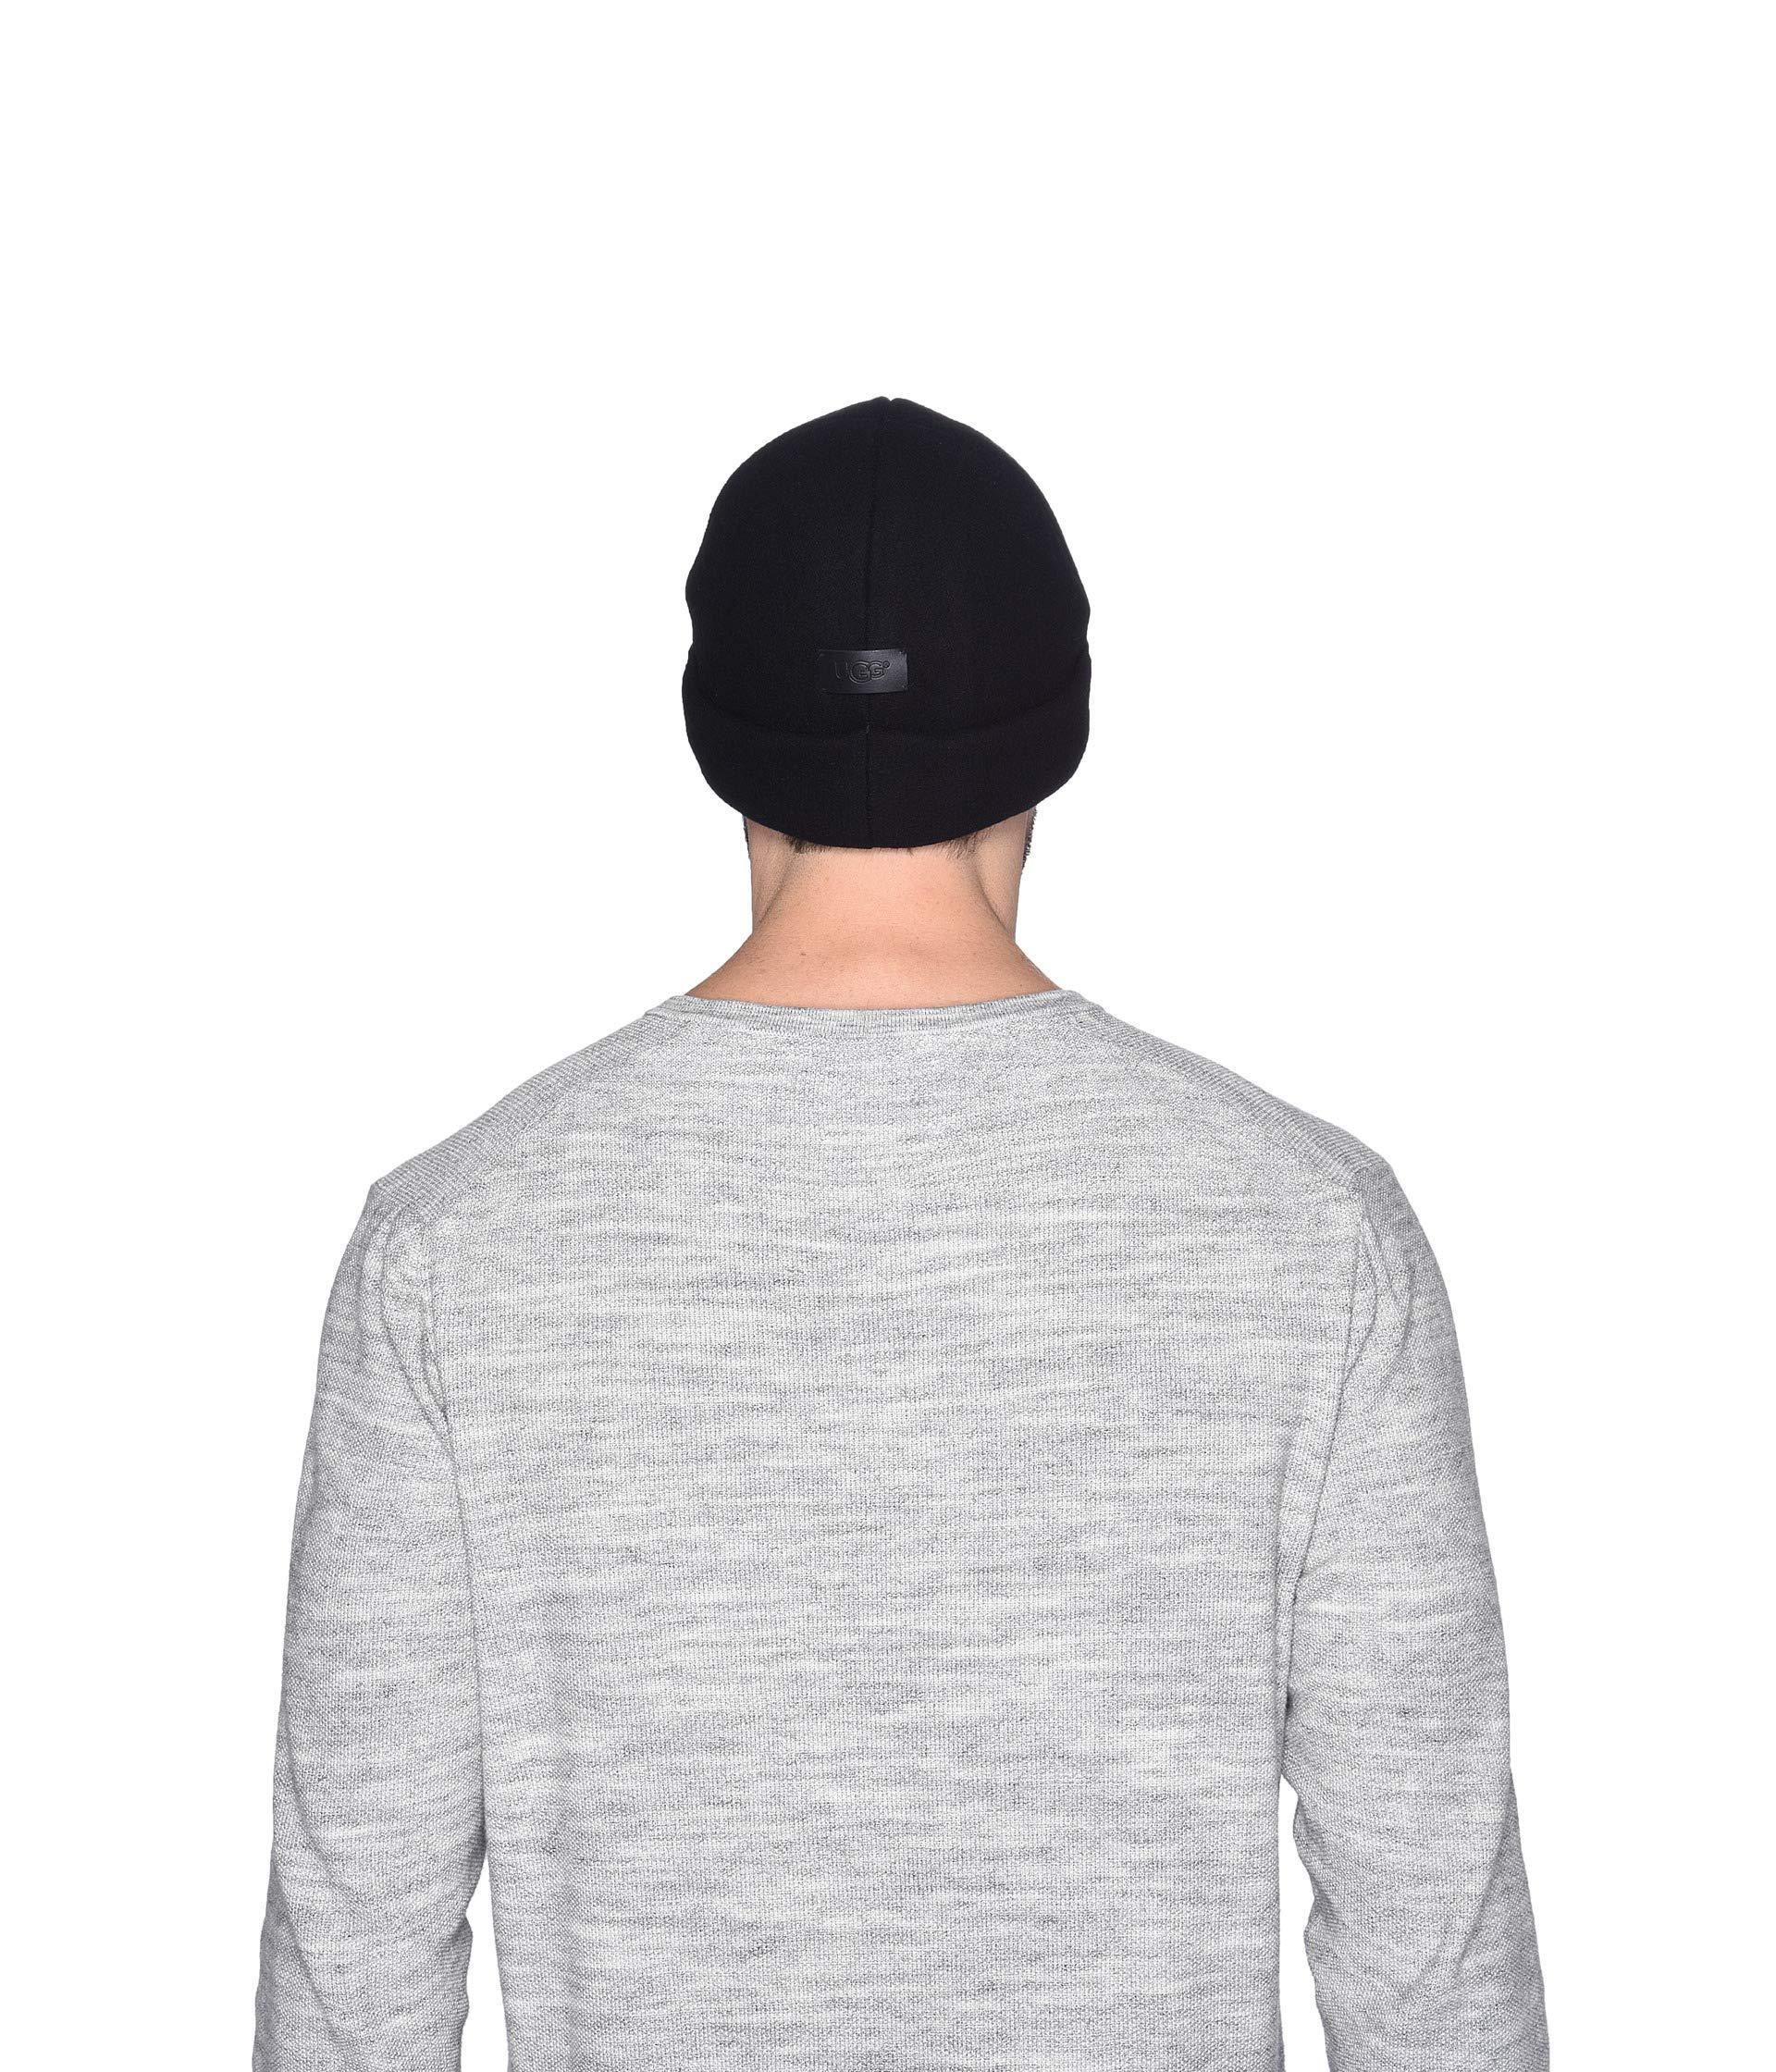 b7cf6f75b Men's Black Fabric Cuff Hat (charcoal) Beanies